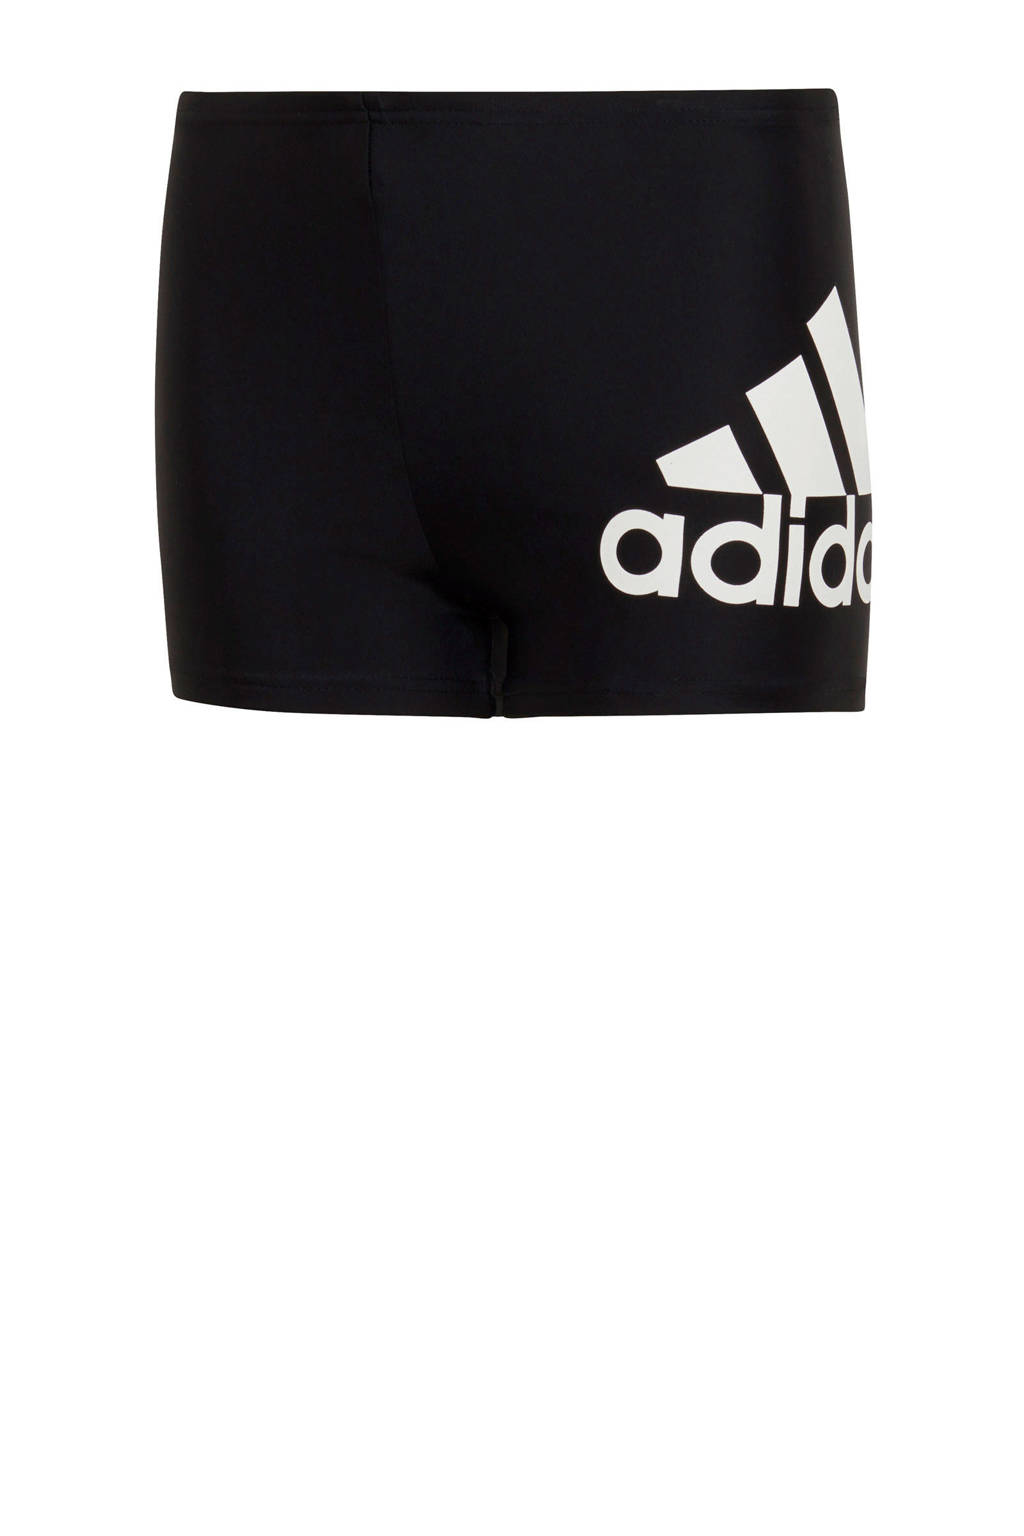 adidas Performance Infinitex zwemboxer met logo zwart, Zwart/wit